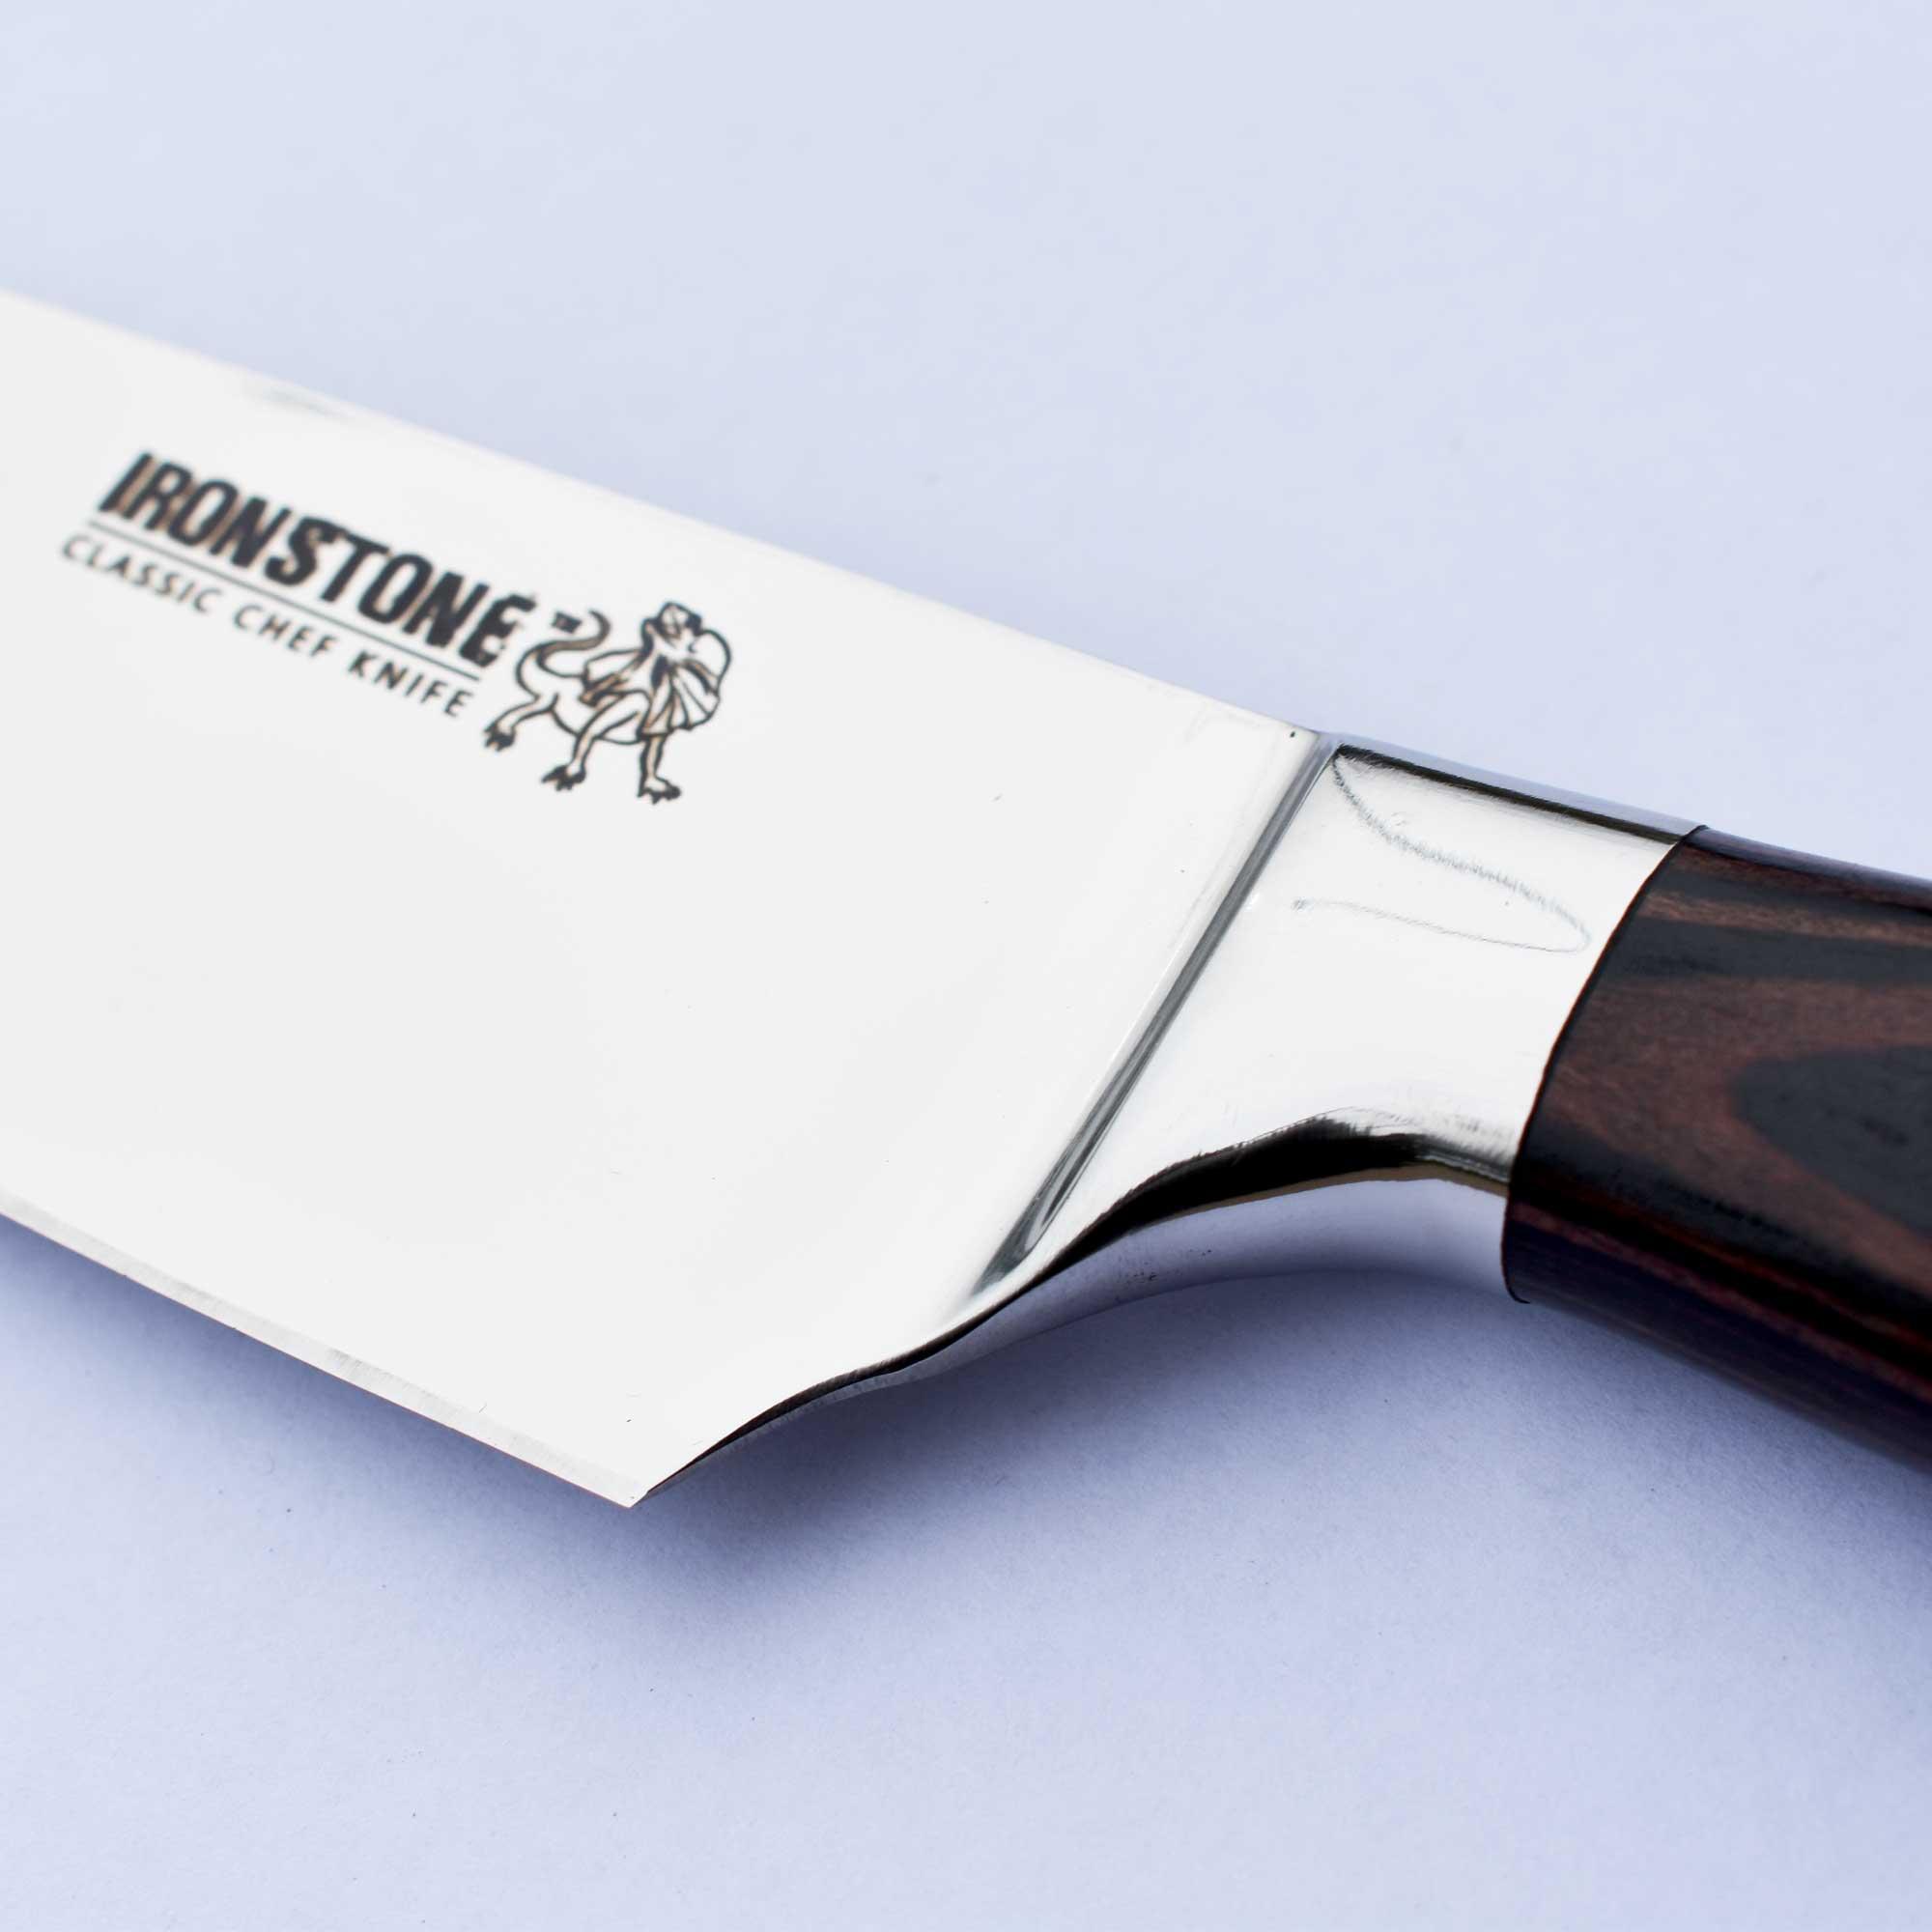 Ironstone-Knife5